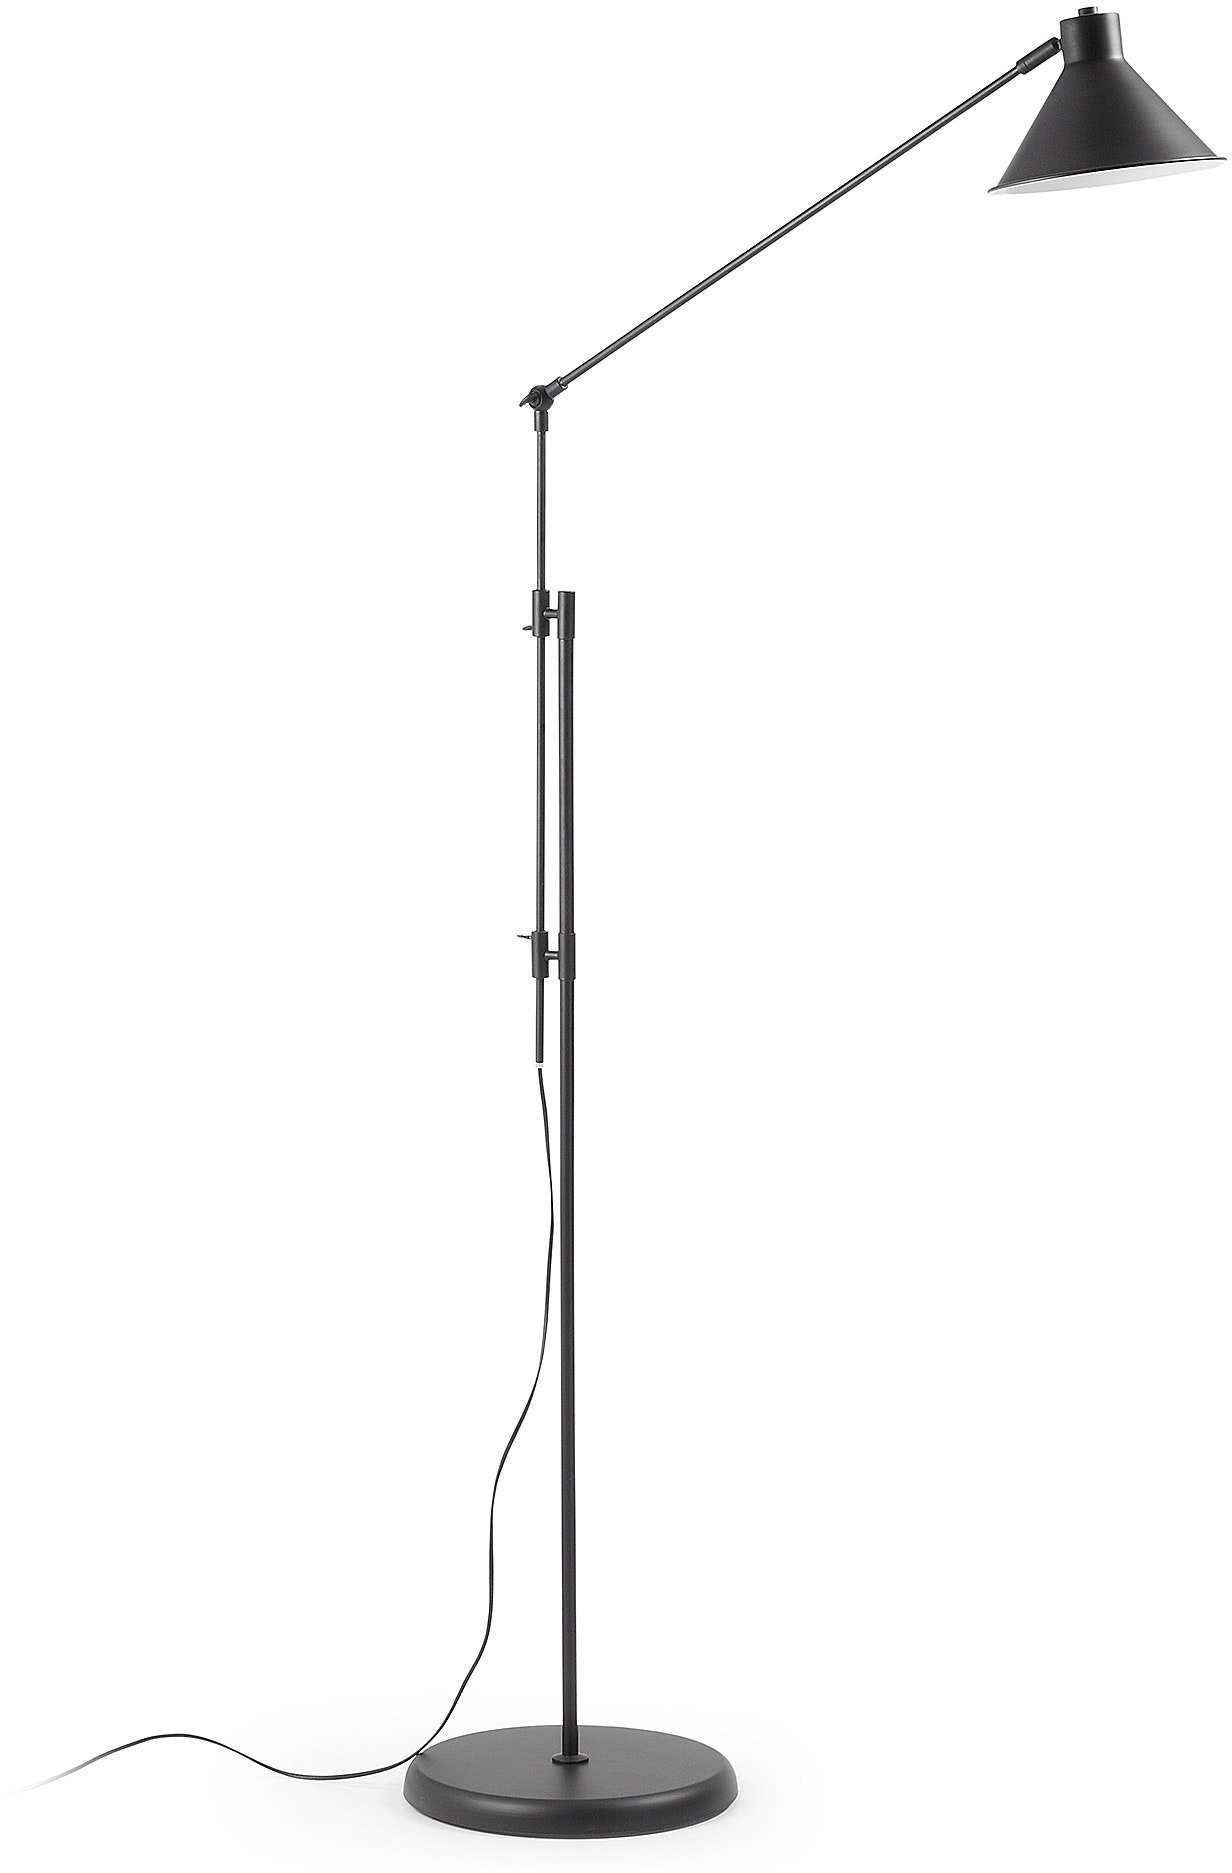 Køb Dione, Gulvlampe by LaForma (H: 220 cm. B: 100 cm. L: 32 cm., Sort)